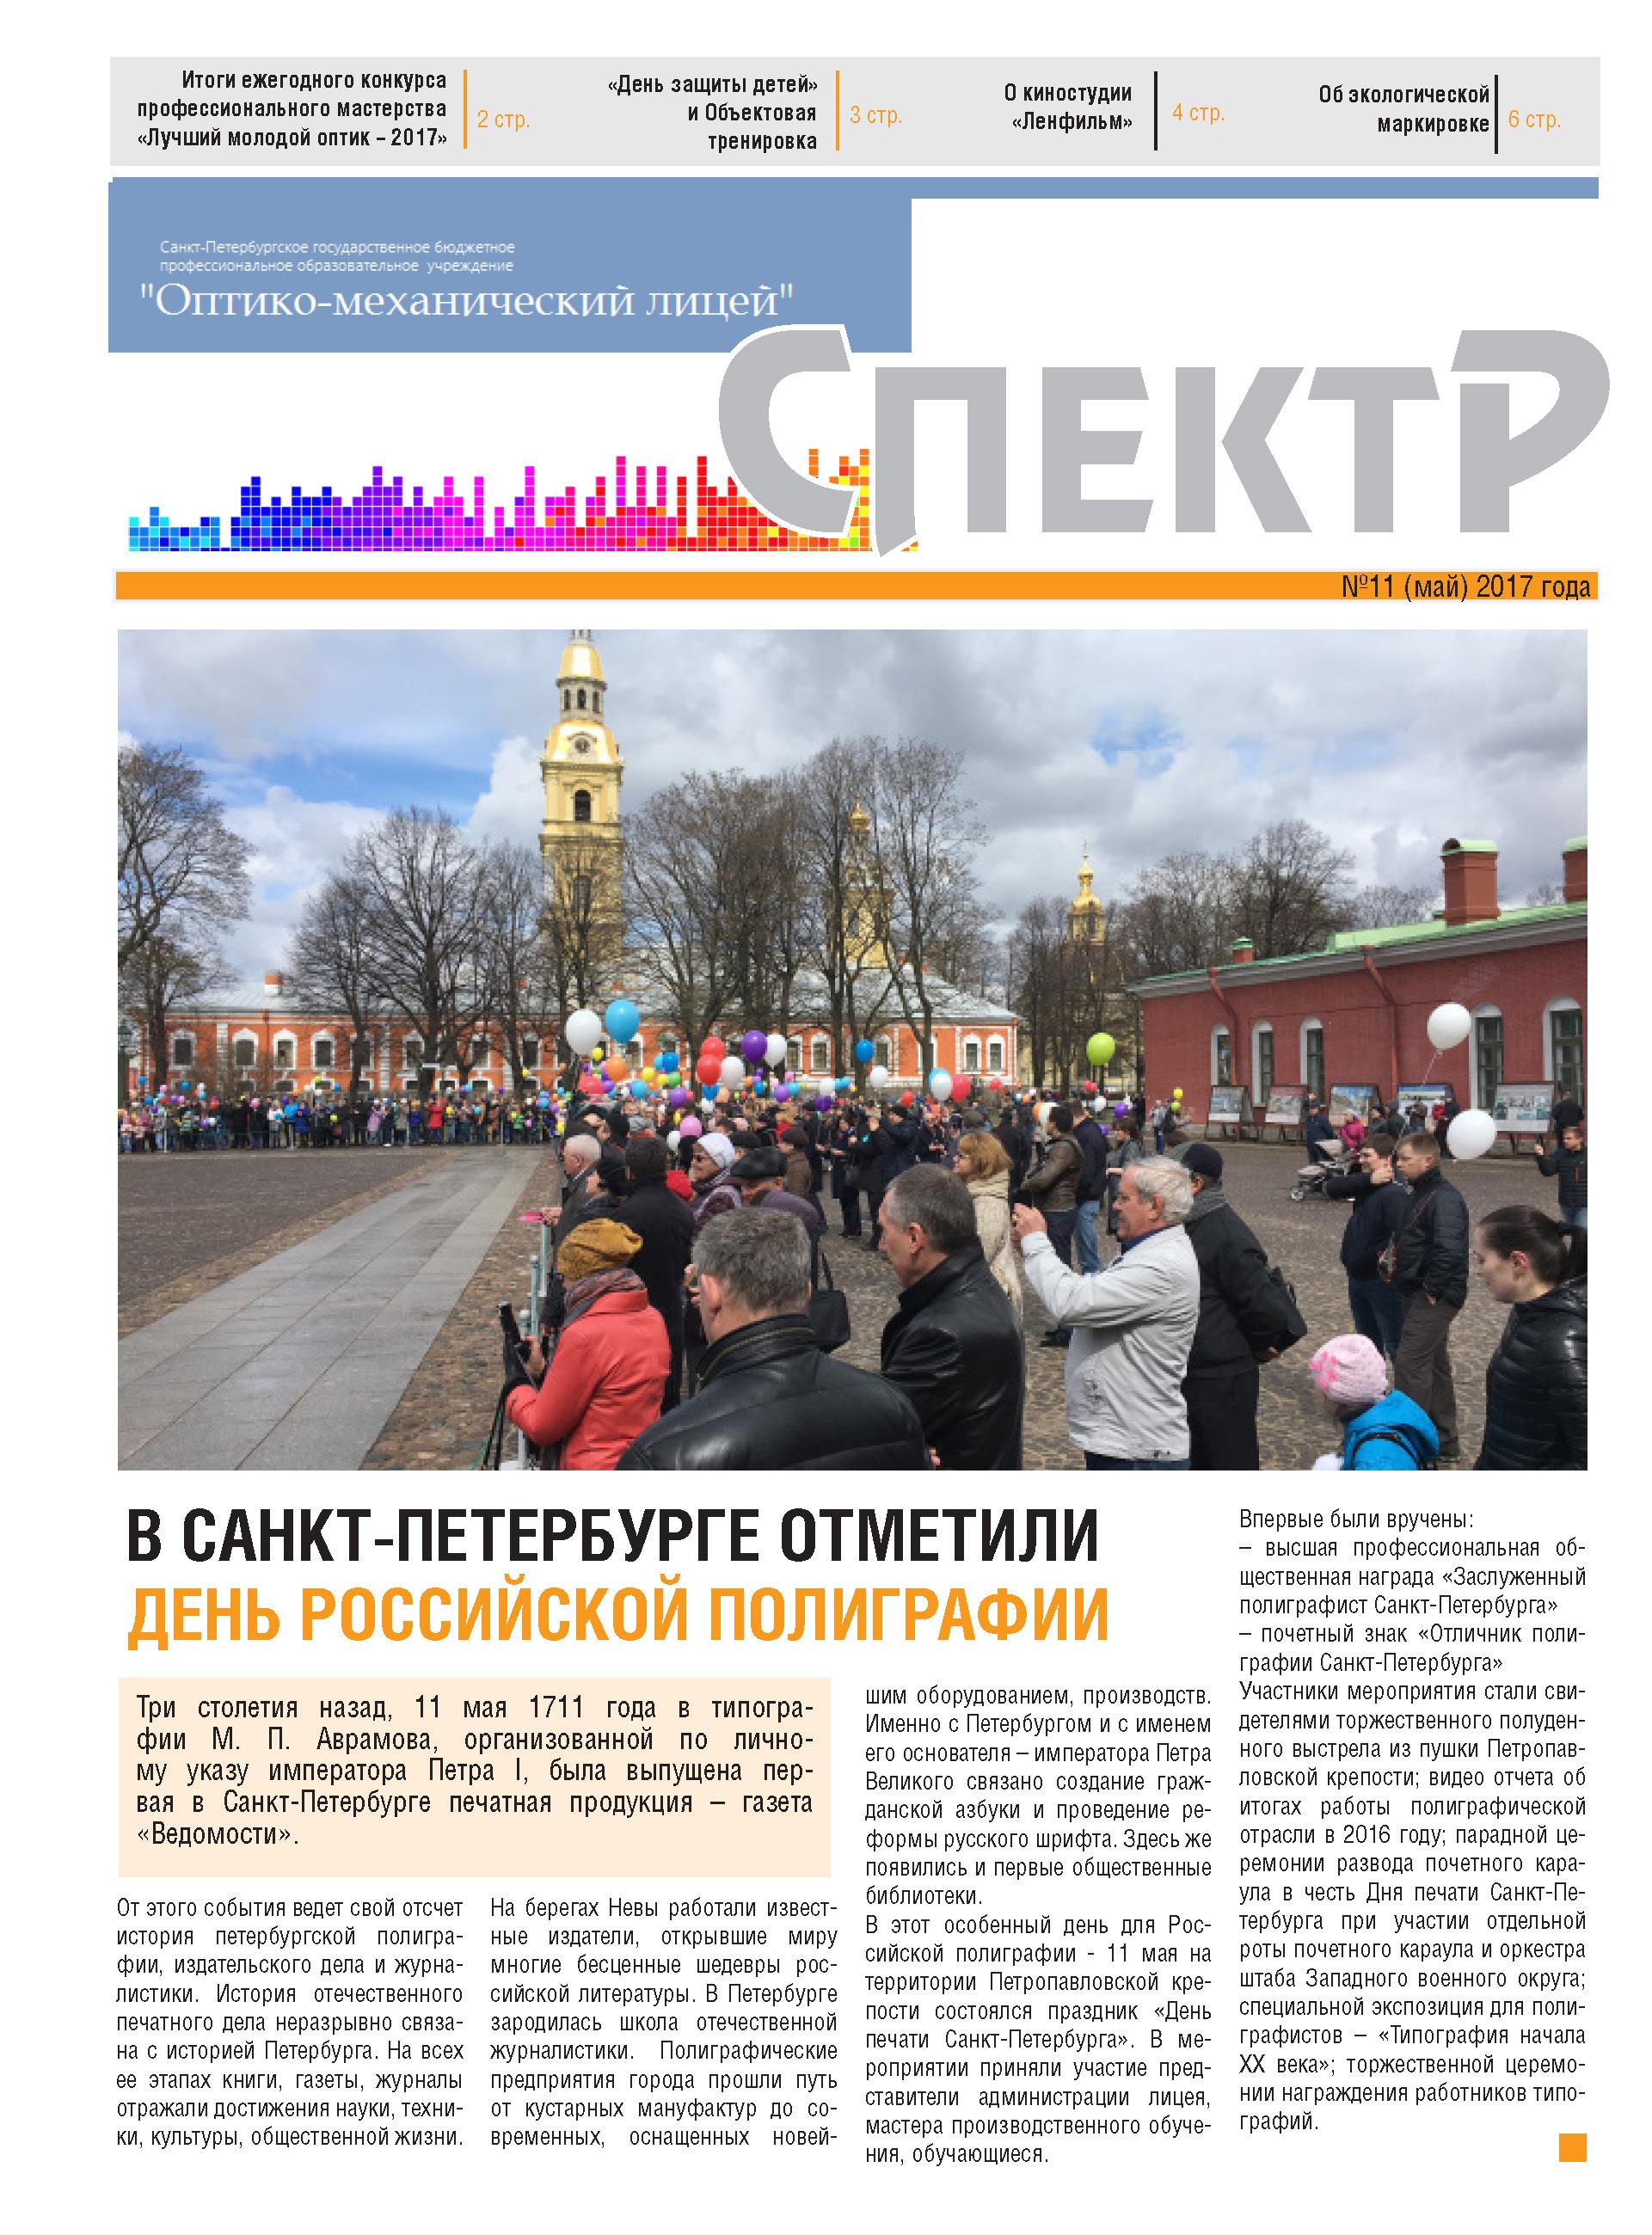 Газета Спектр — выпуск 11 (май 2017)